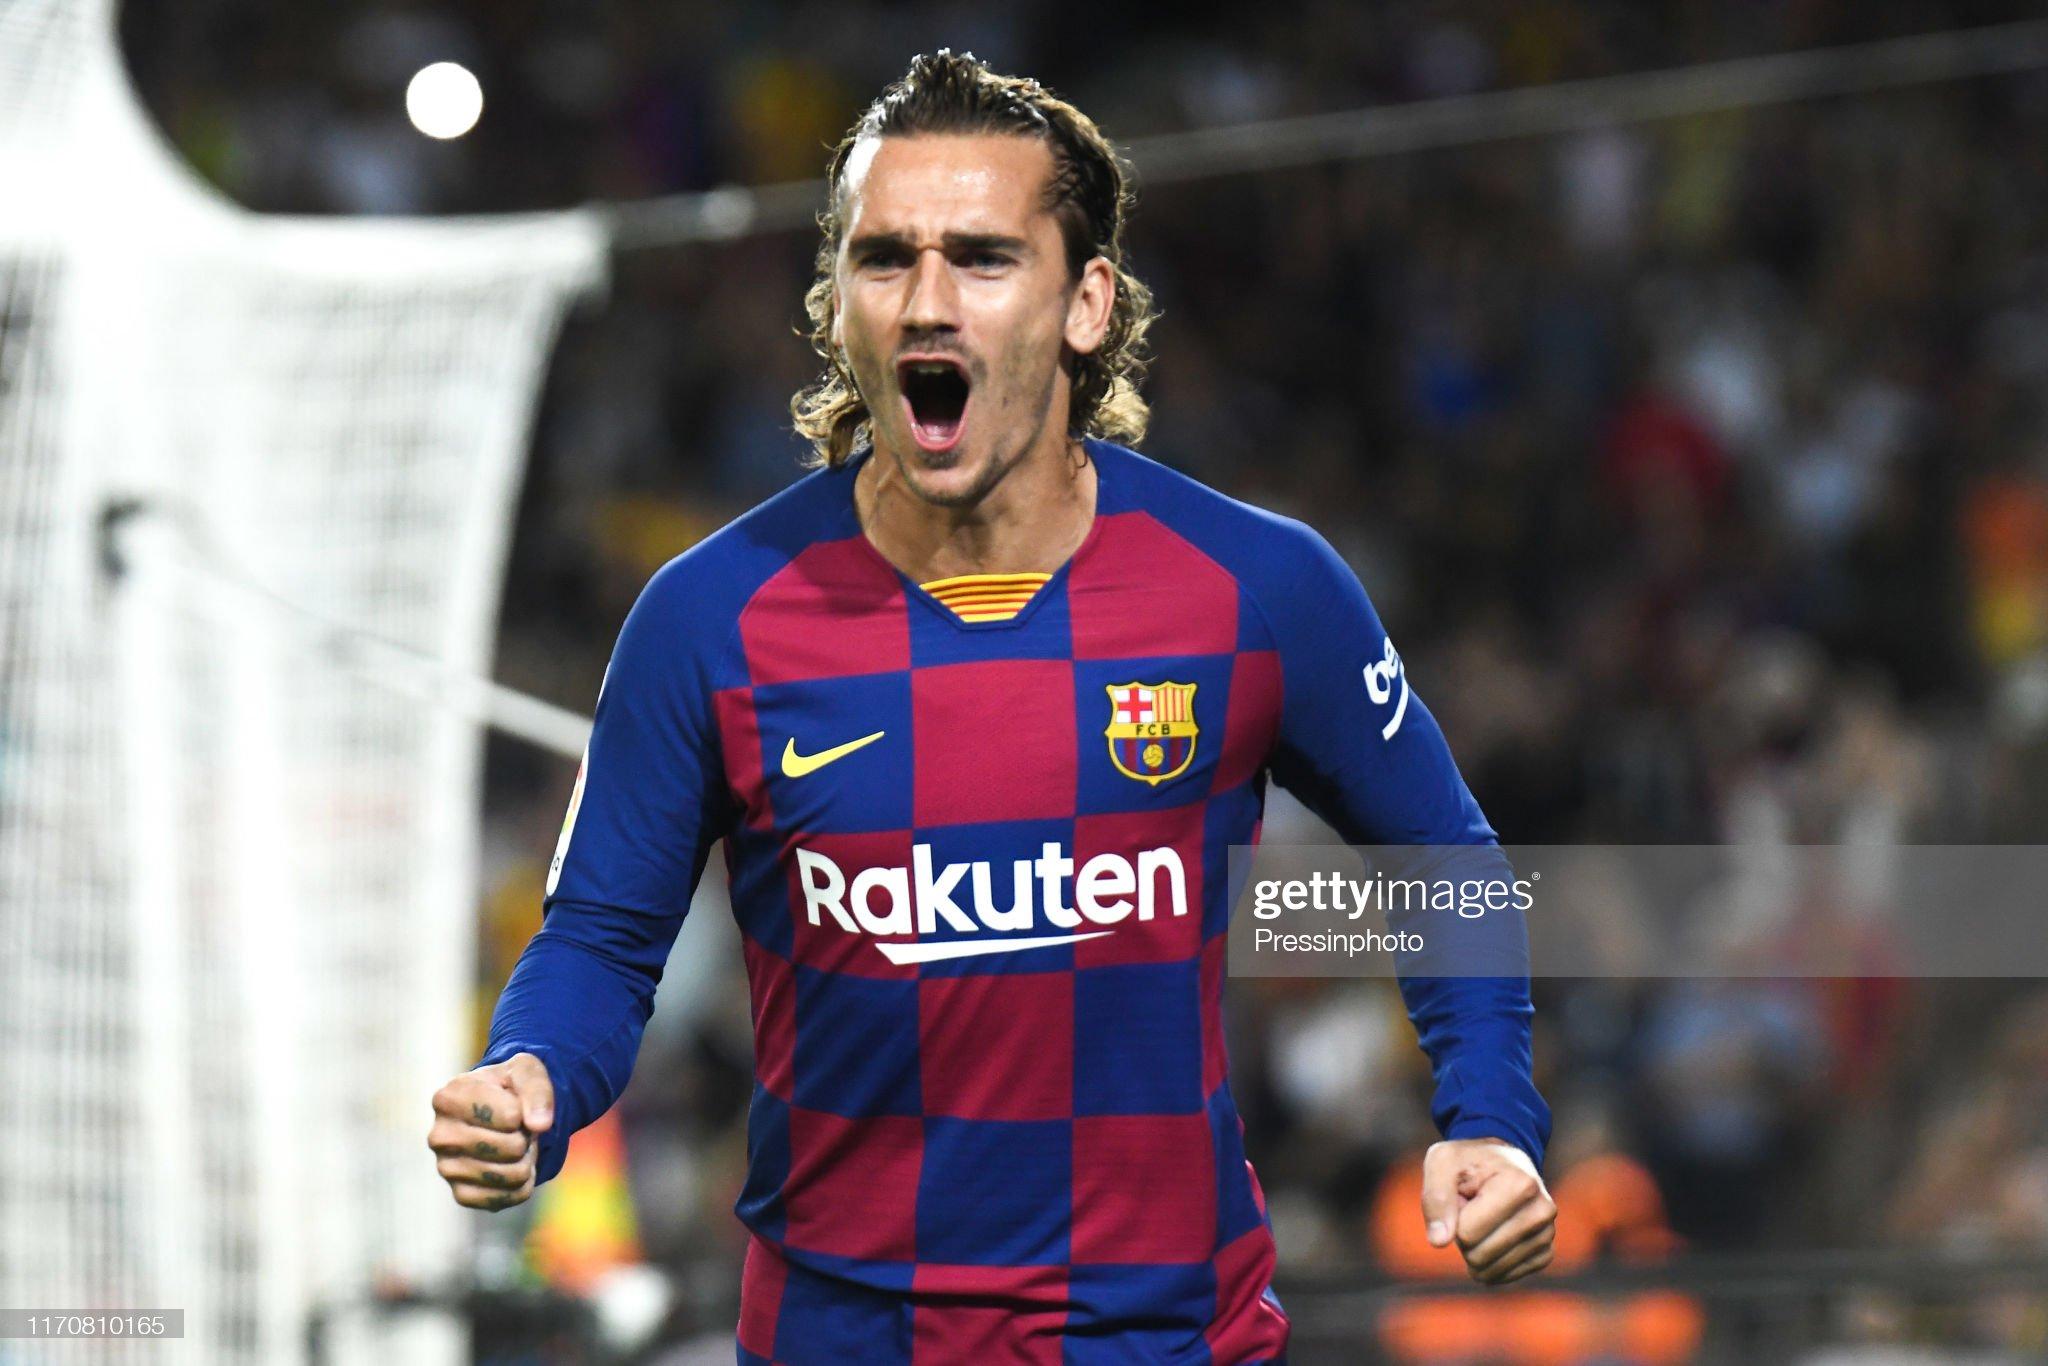 صور مباراة : برشلونة - فياريال 2-1 ( 24-09-2019 )  Antoine-griezmann-of-fc-barcelona-celebrates-his-goal-during-the-liga-picture-id1170810165?s=2048x2048